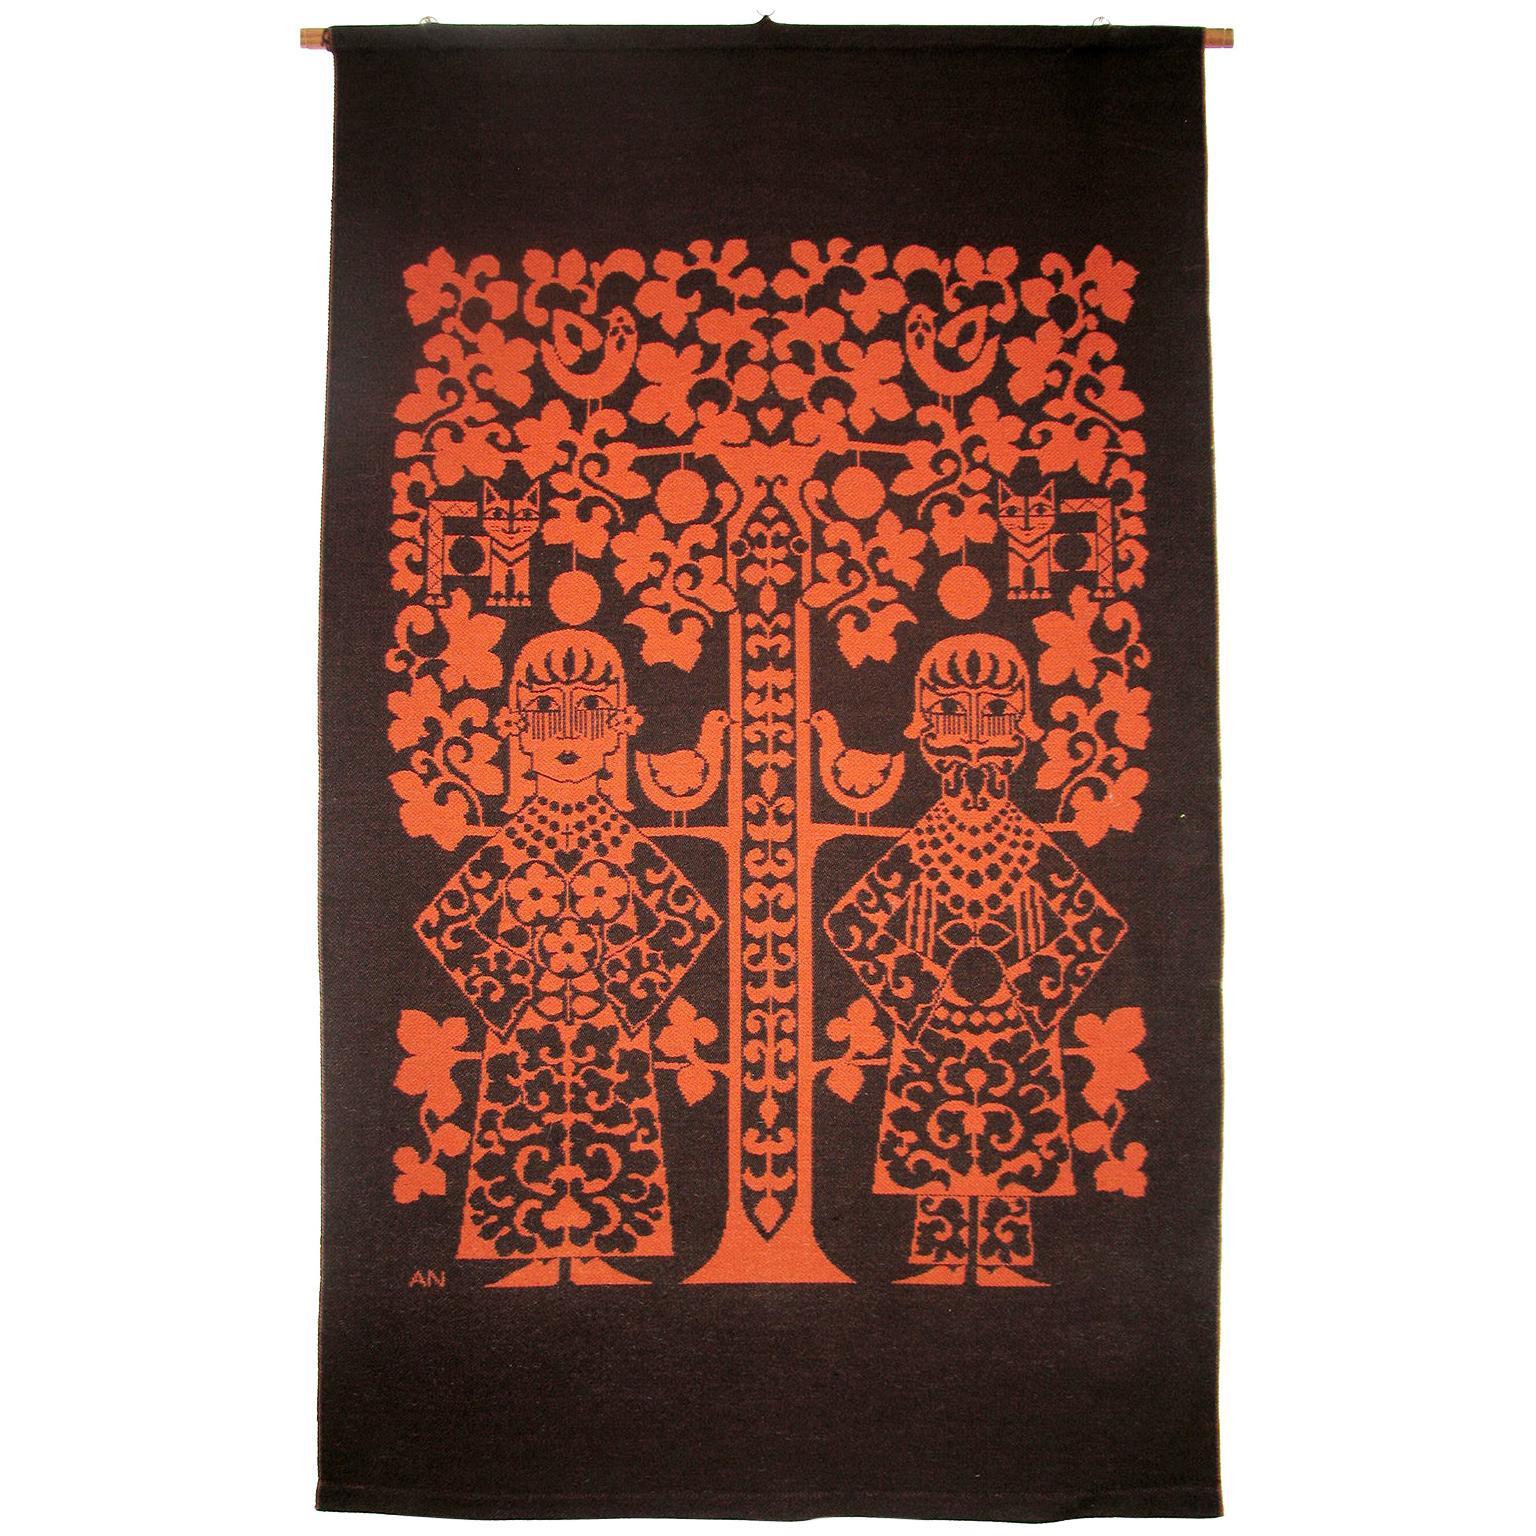 Mid-Century Modern Scandinavian Jacquard Wall Tapestry